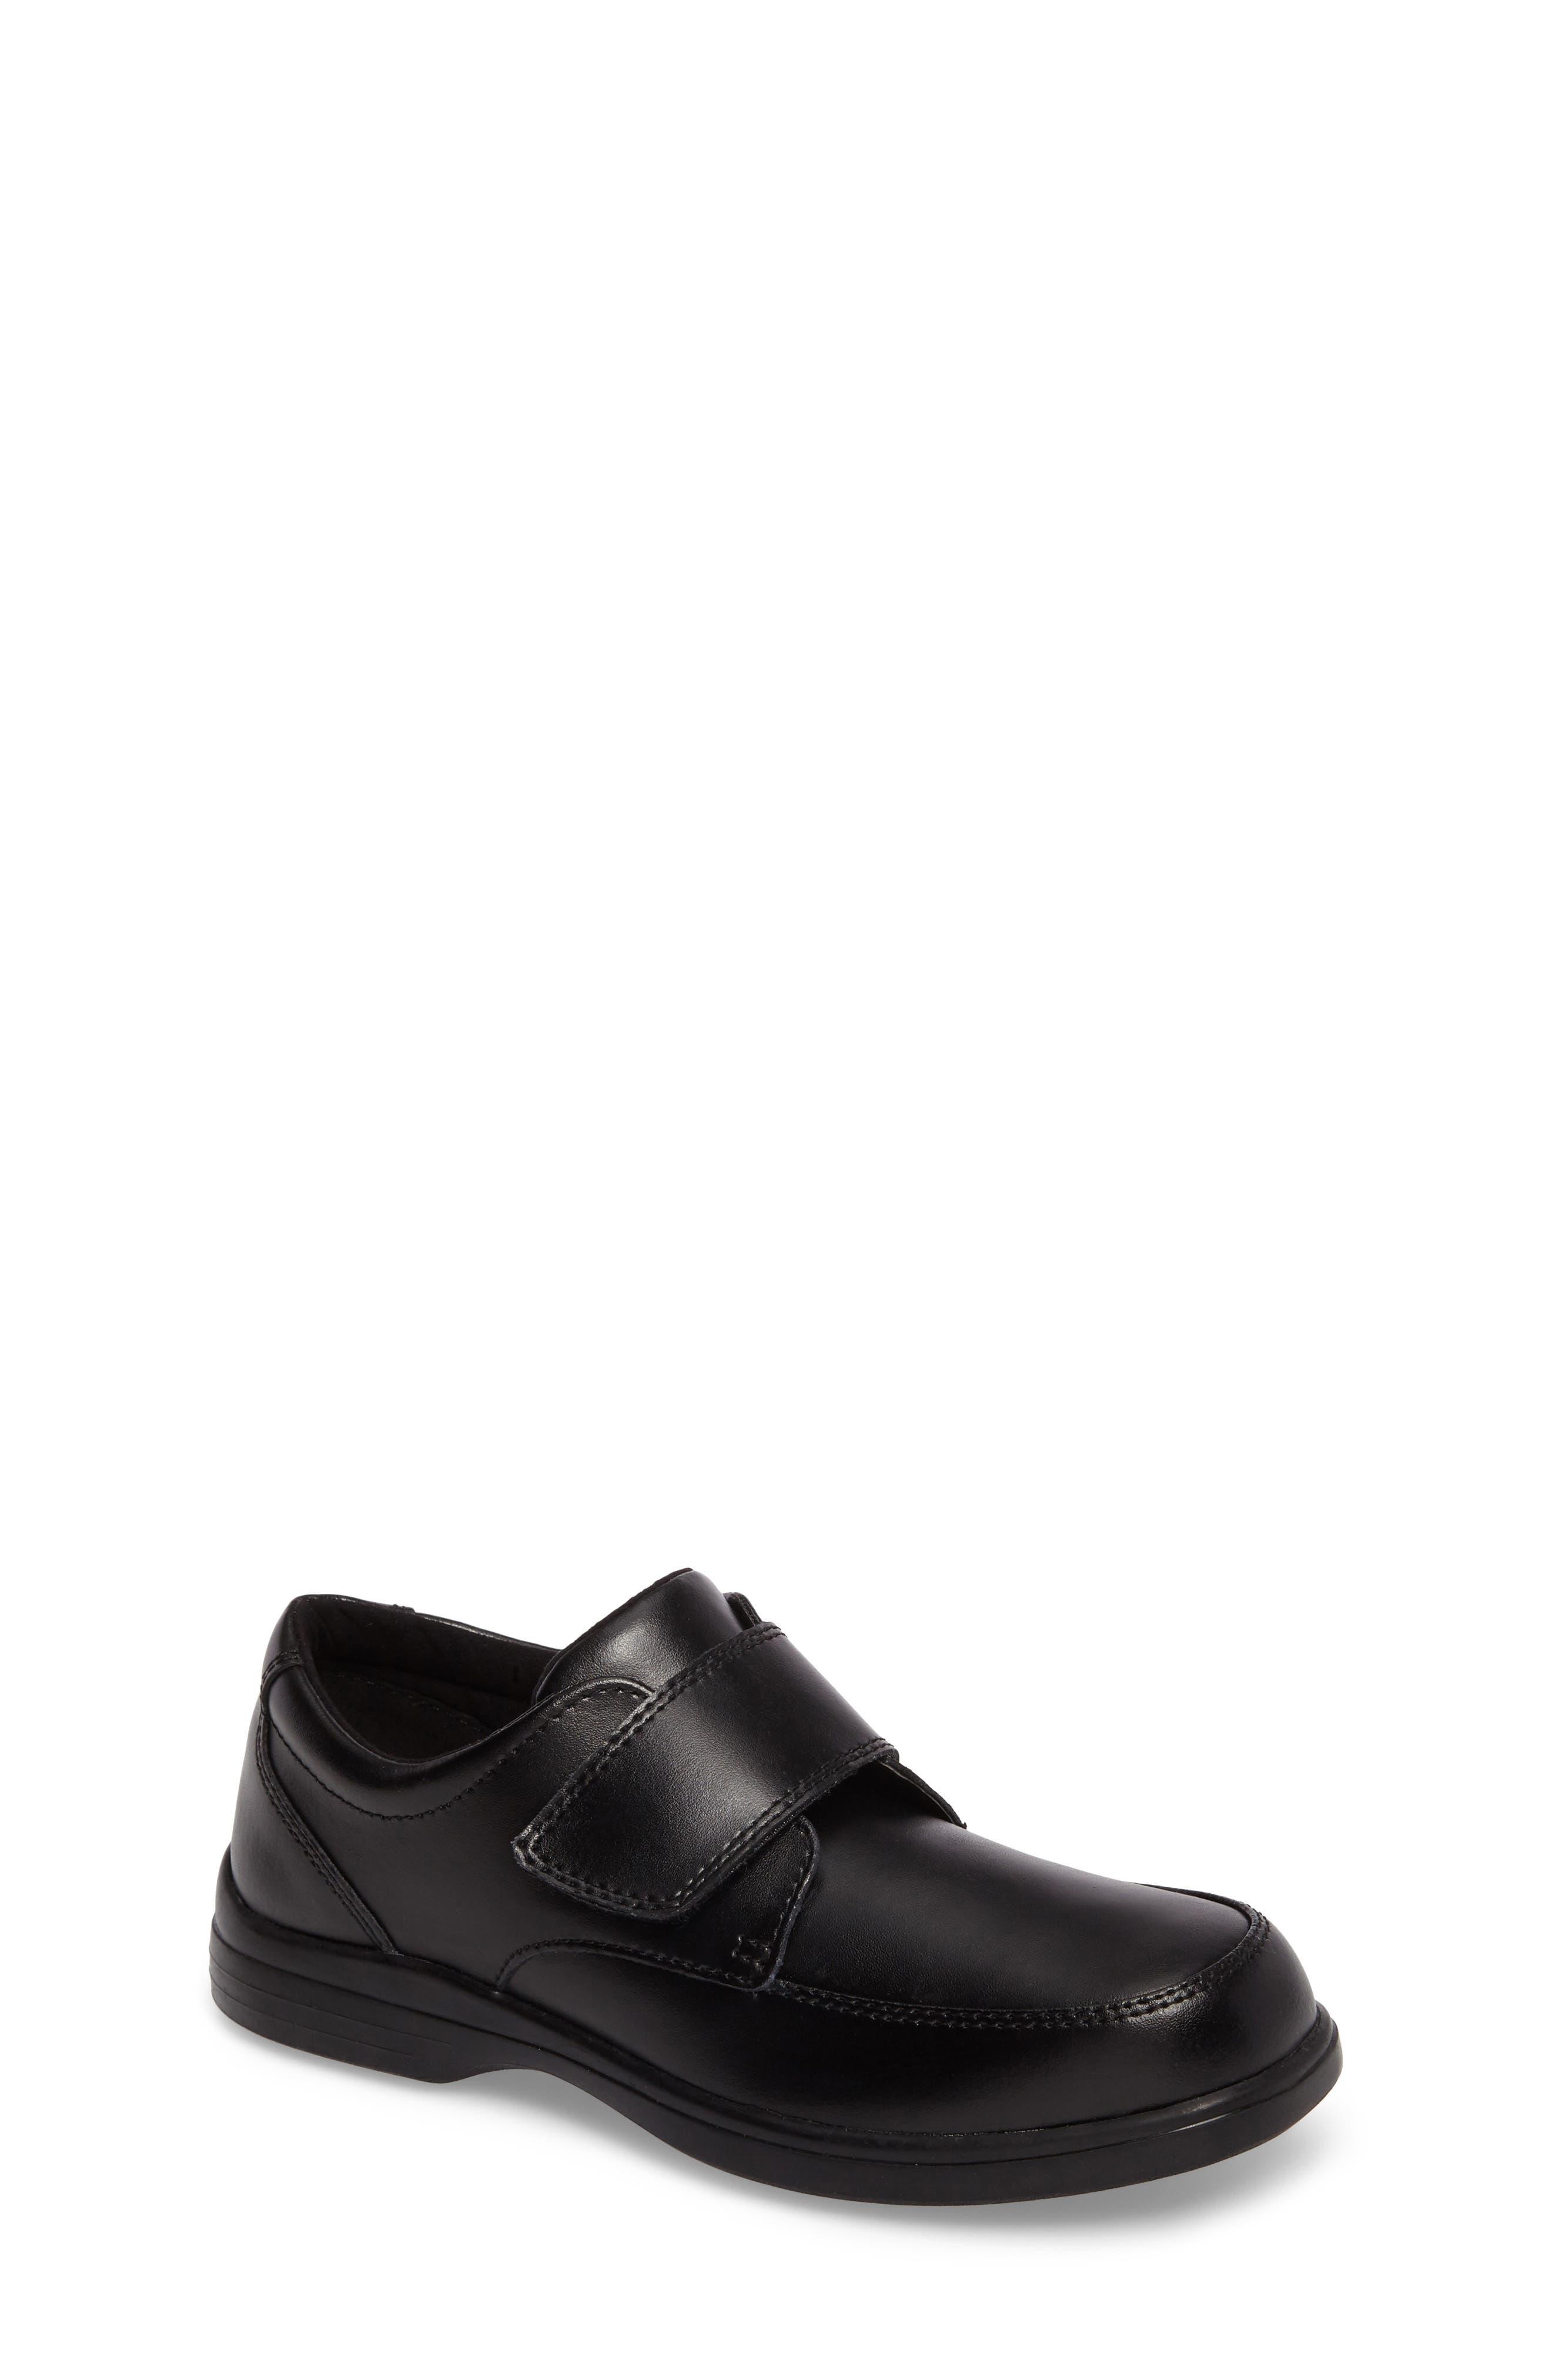 Hush Puppies Gavin Front Strap Dress Shoe,                             Main thumbnail 1, color,                             Black Leather